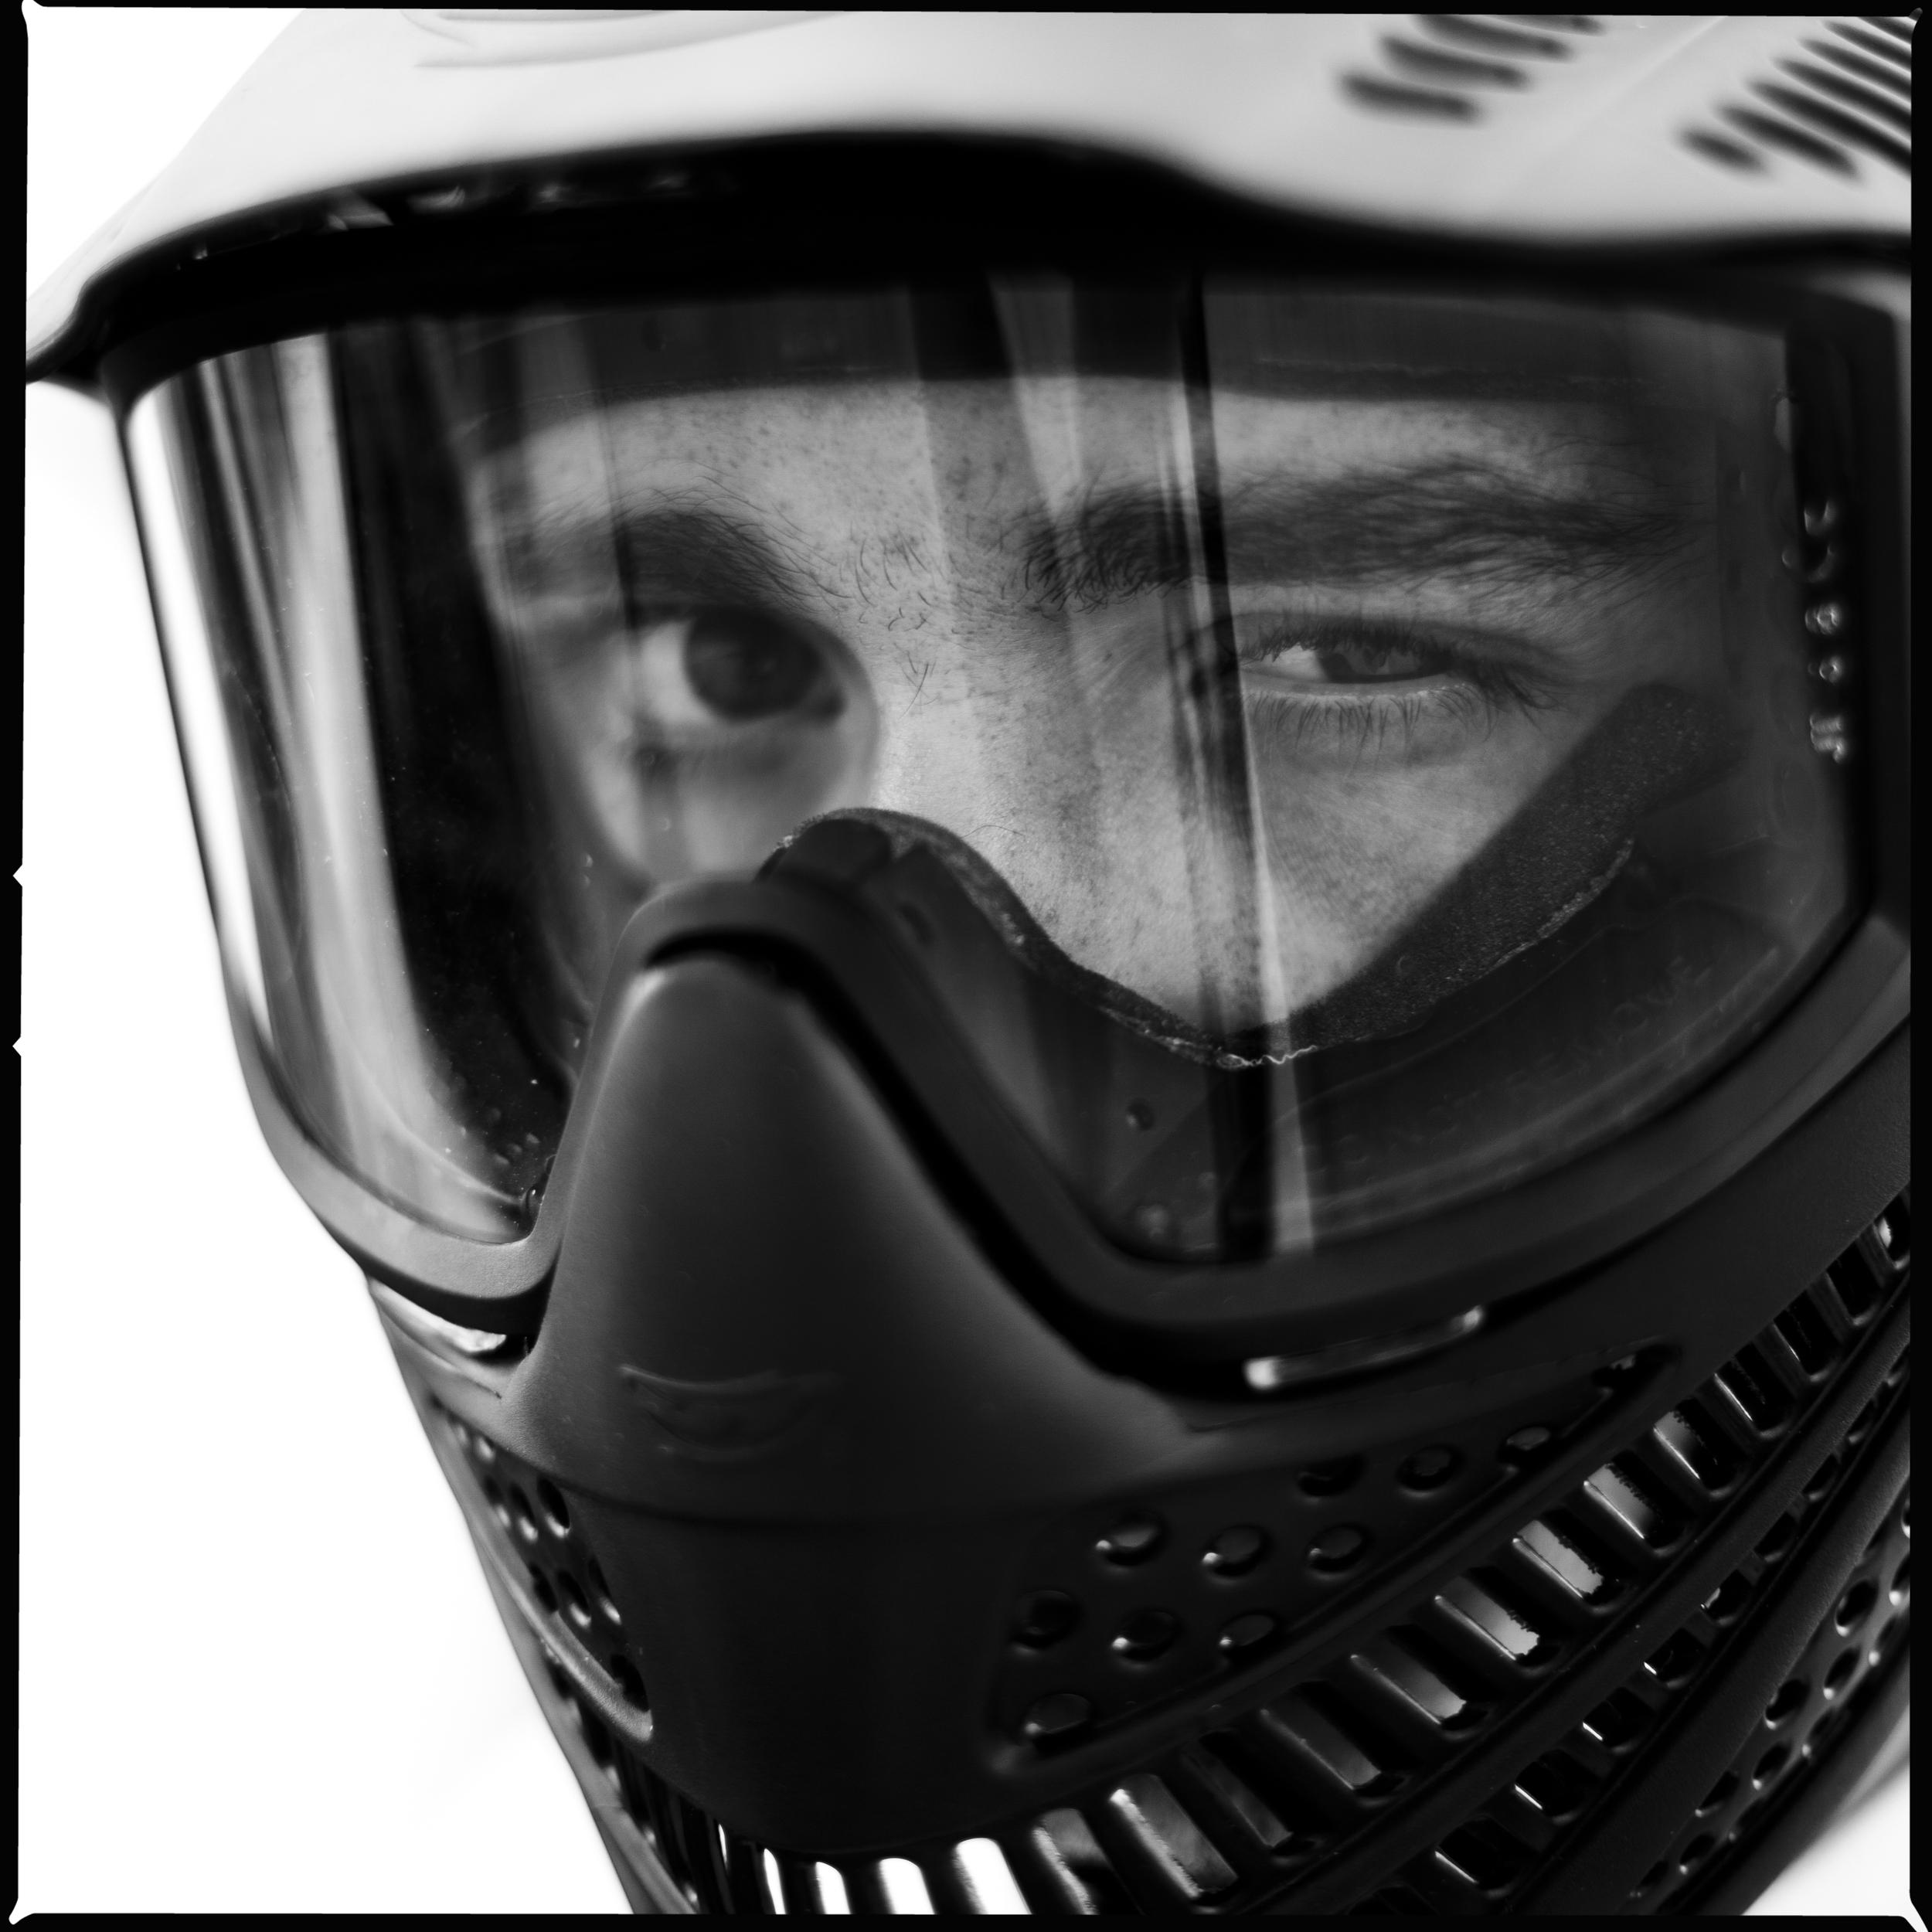 Oscar_Arribas_Portrait_photography_retrato_editorial_project_fotografia_studio_10.jpg